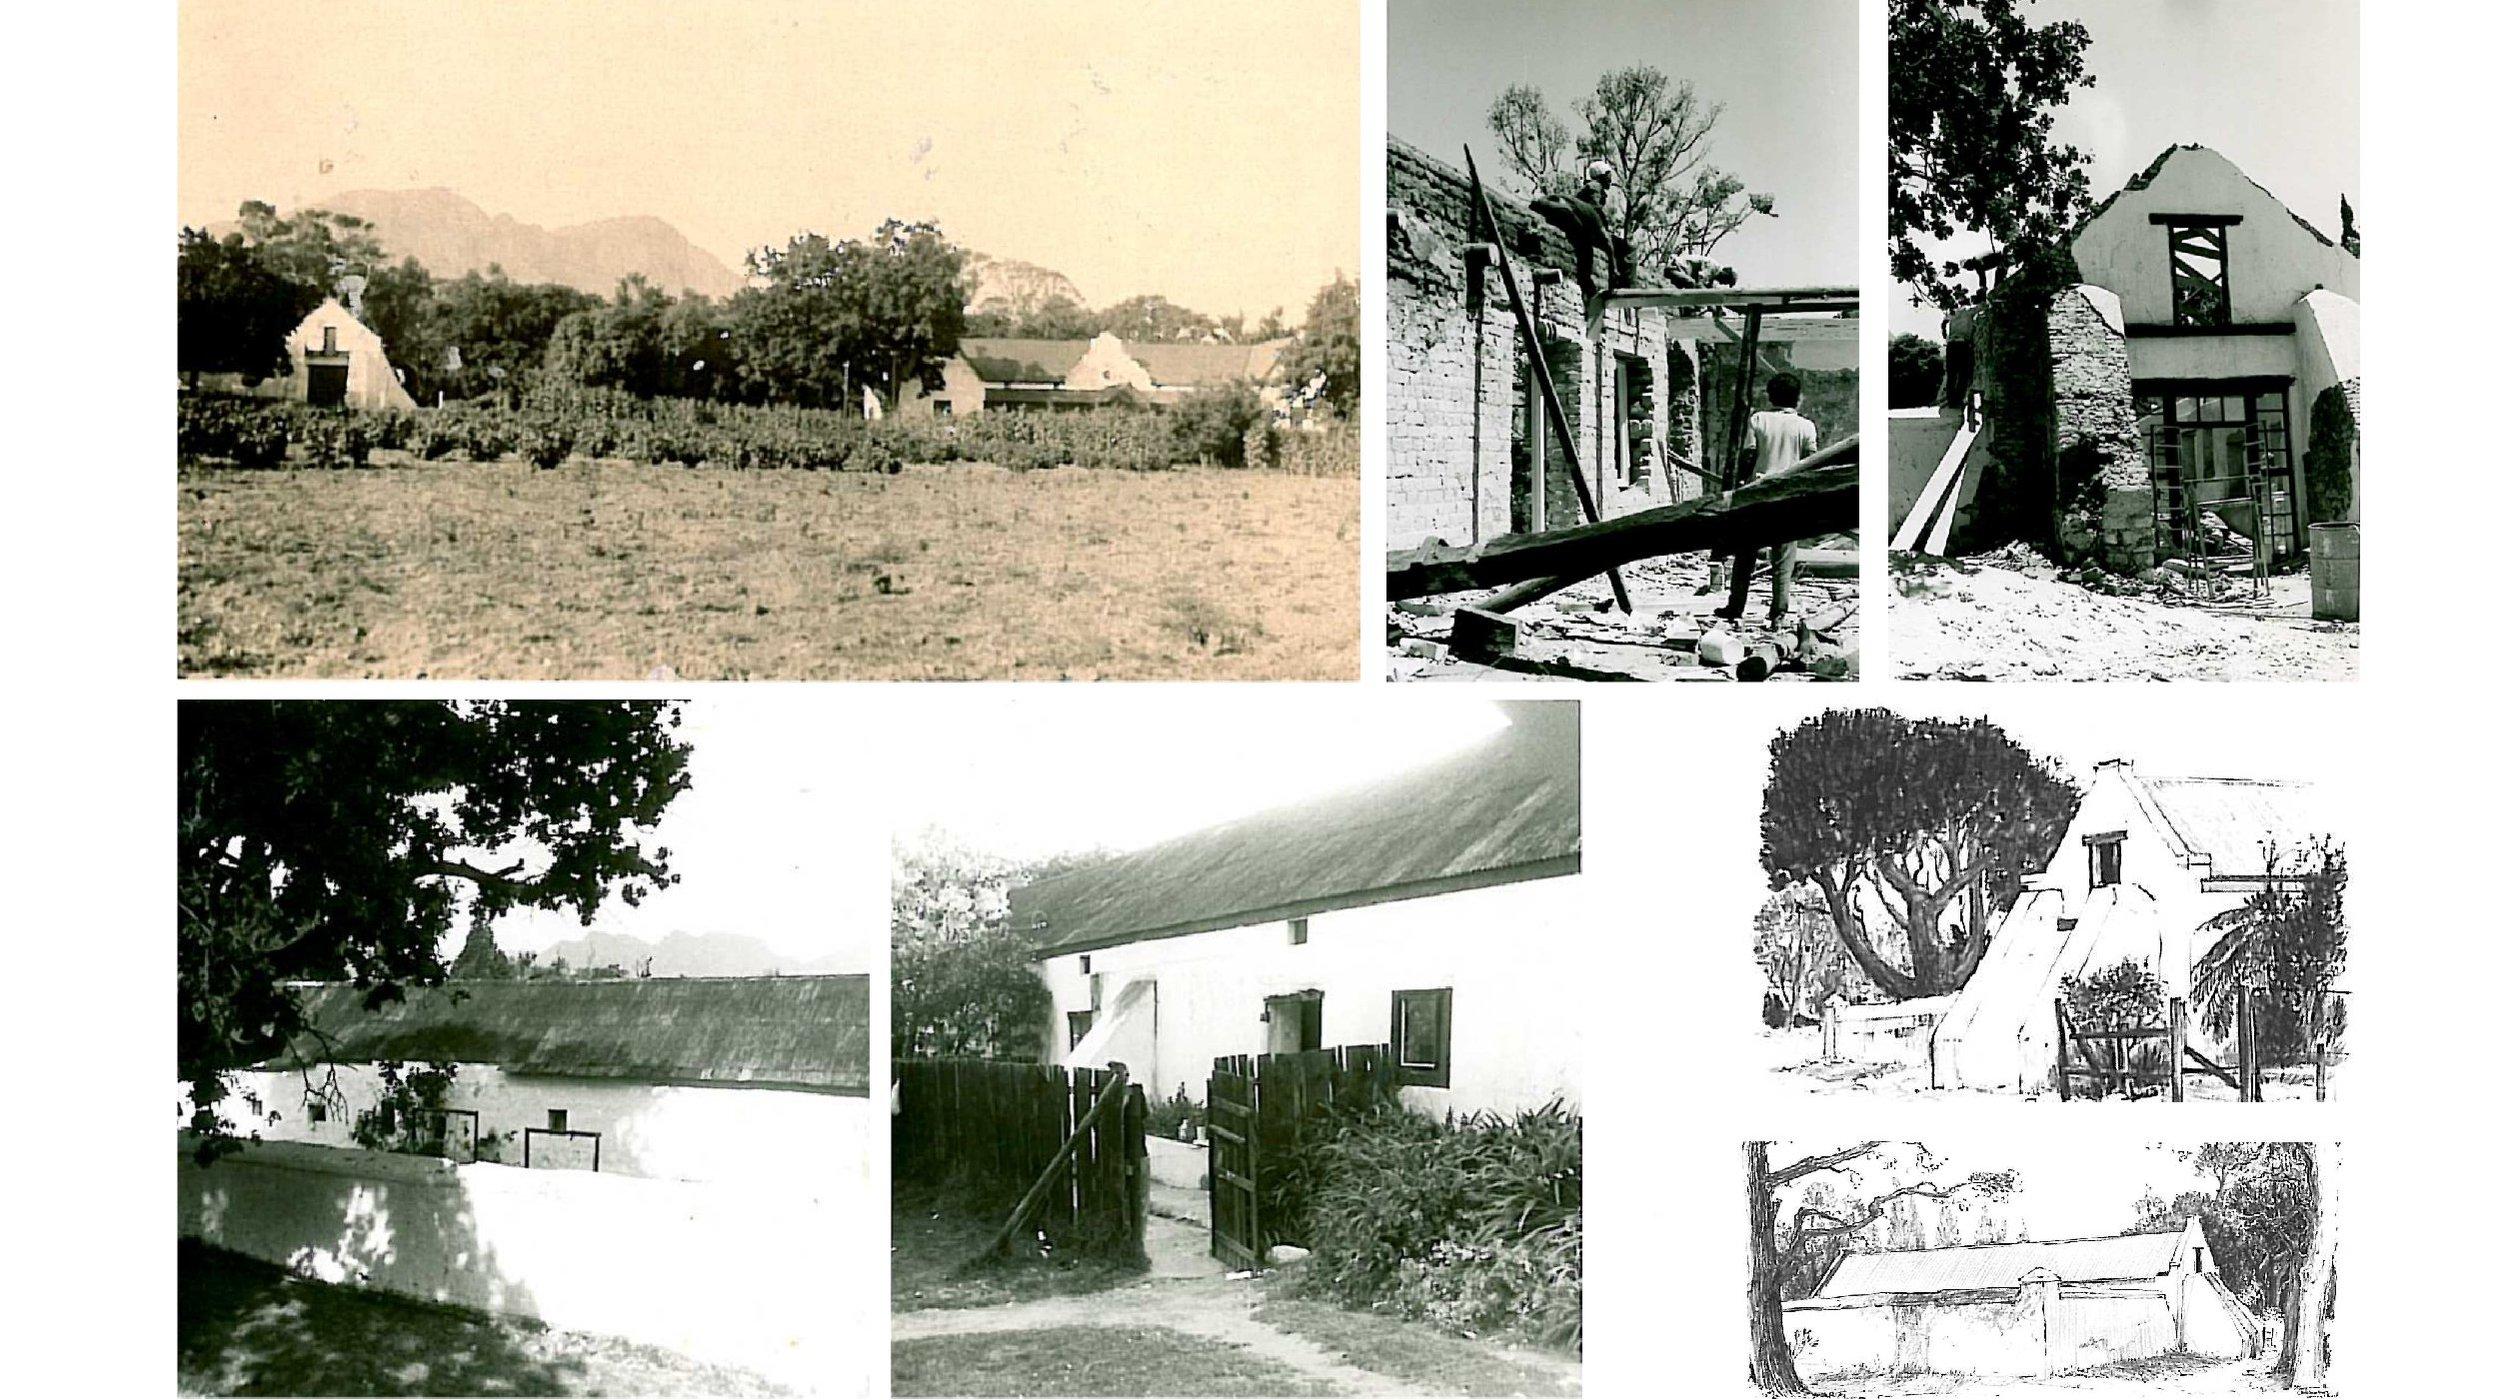 001 historic photos combo2.jpg